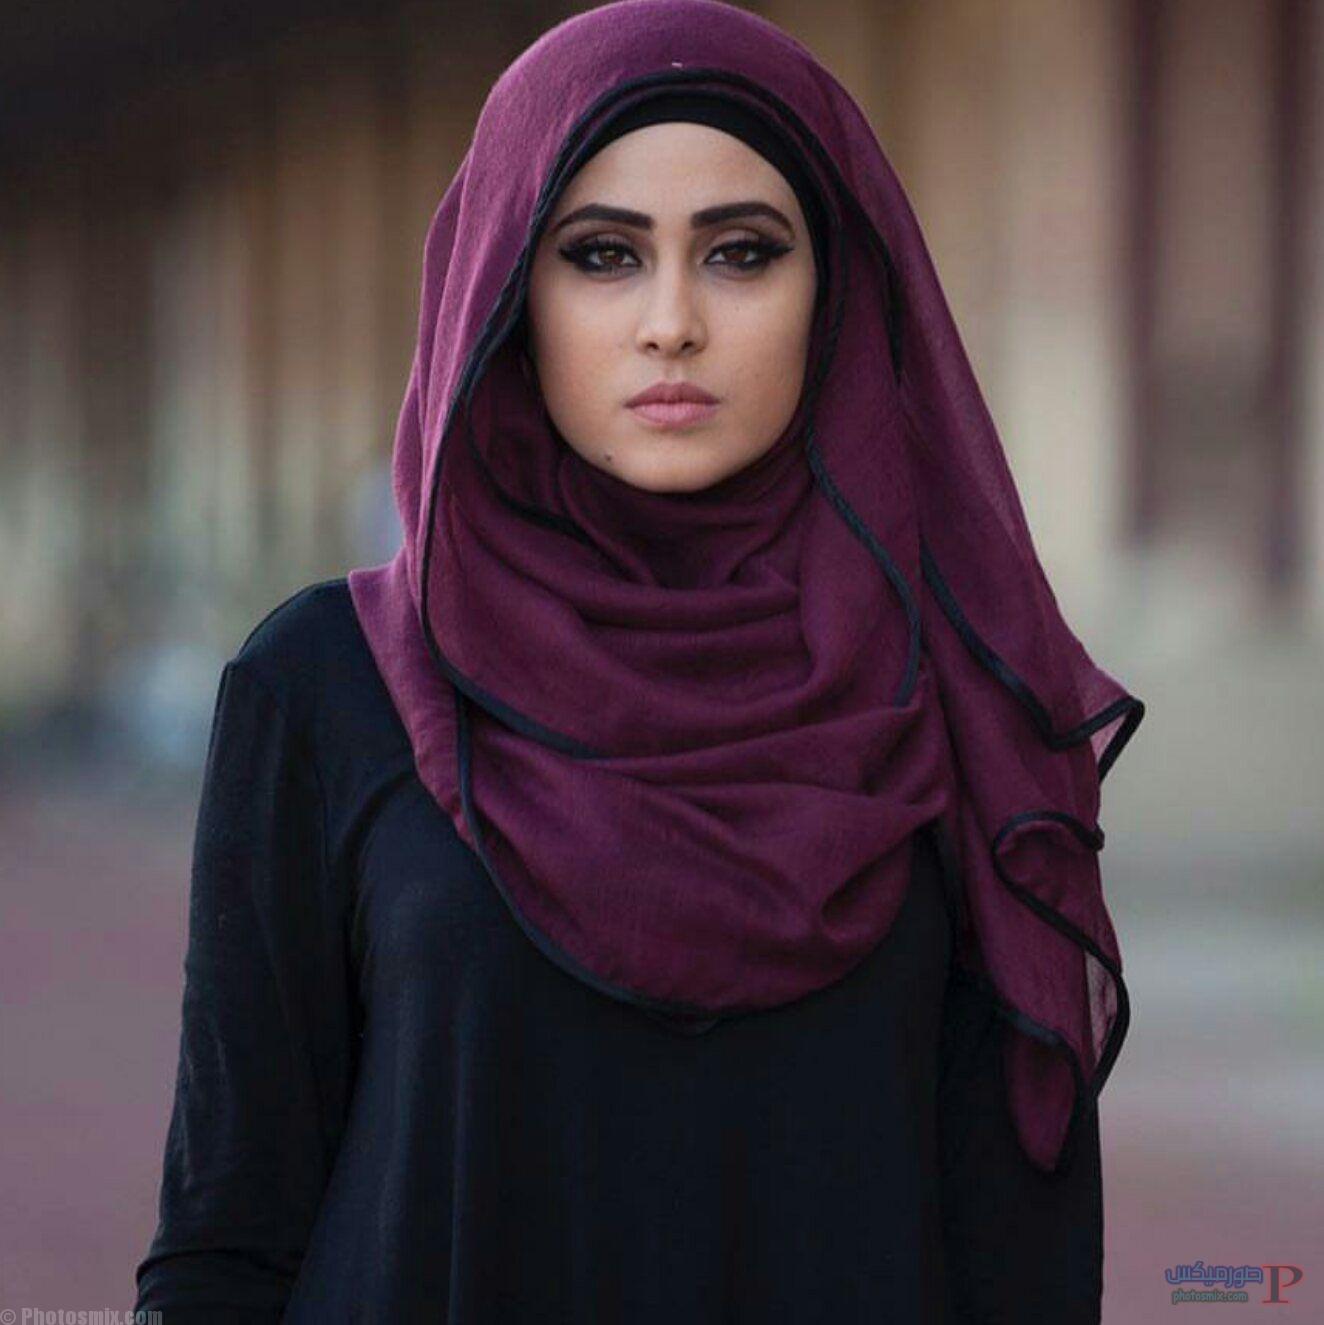 3e5df61fa صور بنات محجبات، صور بنات 2019، أجمل صور بنات فيسبوك HD 2020 – صورميكس